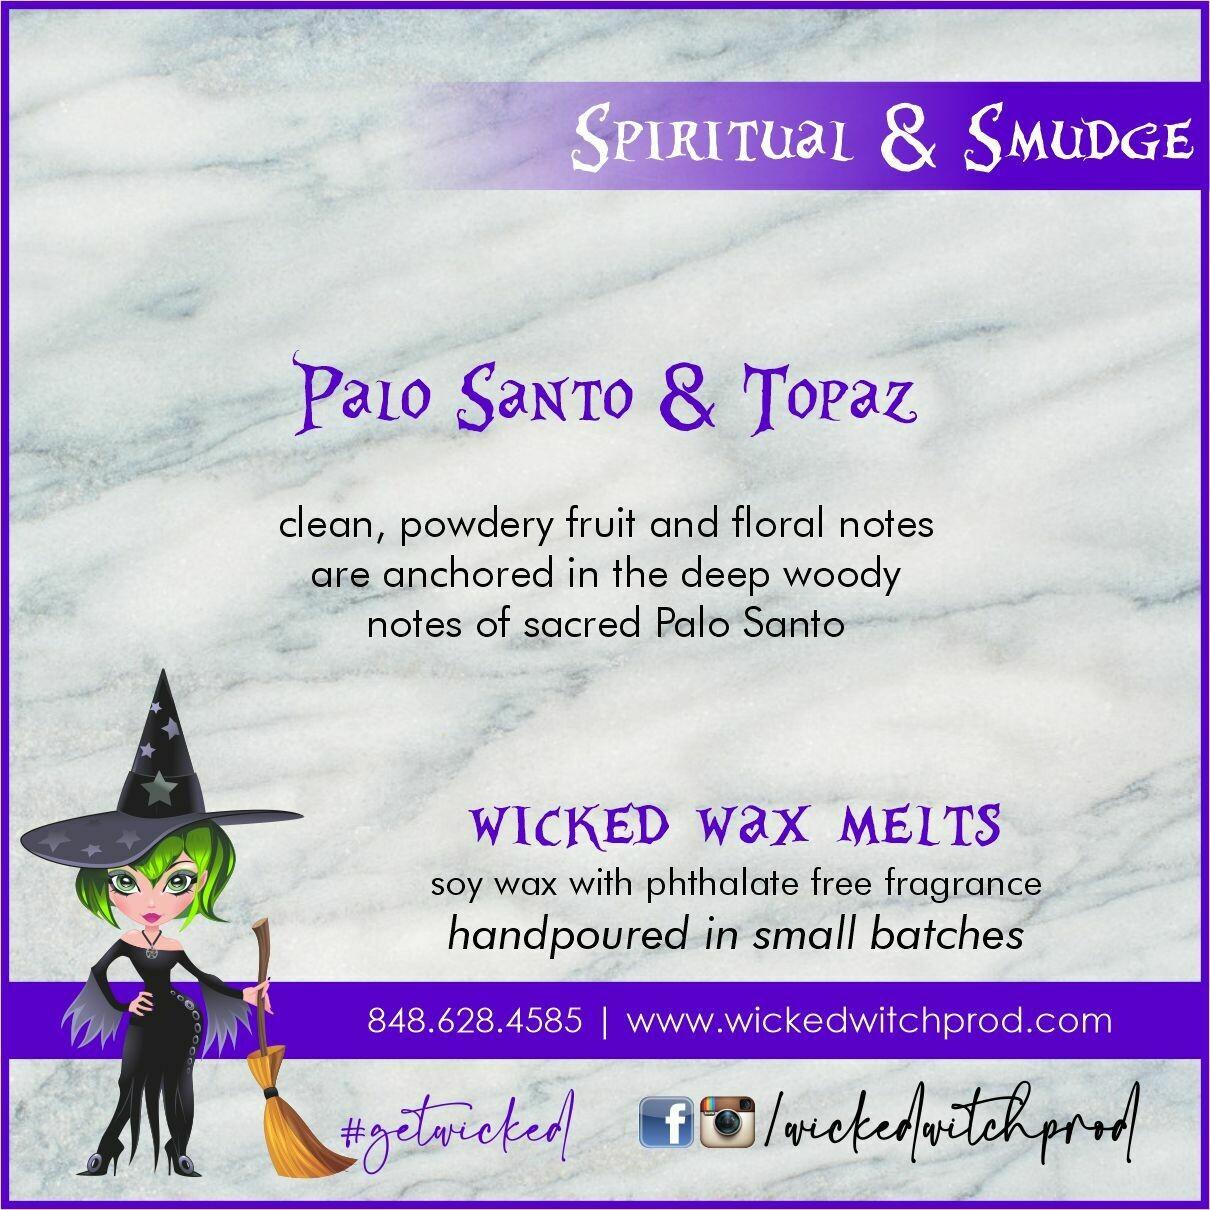 Palo Santo & Topaz Wicked Wax Melts